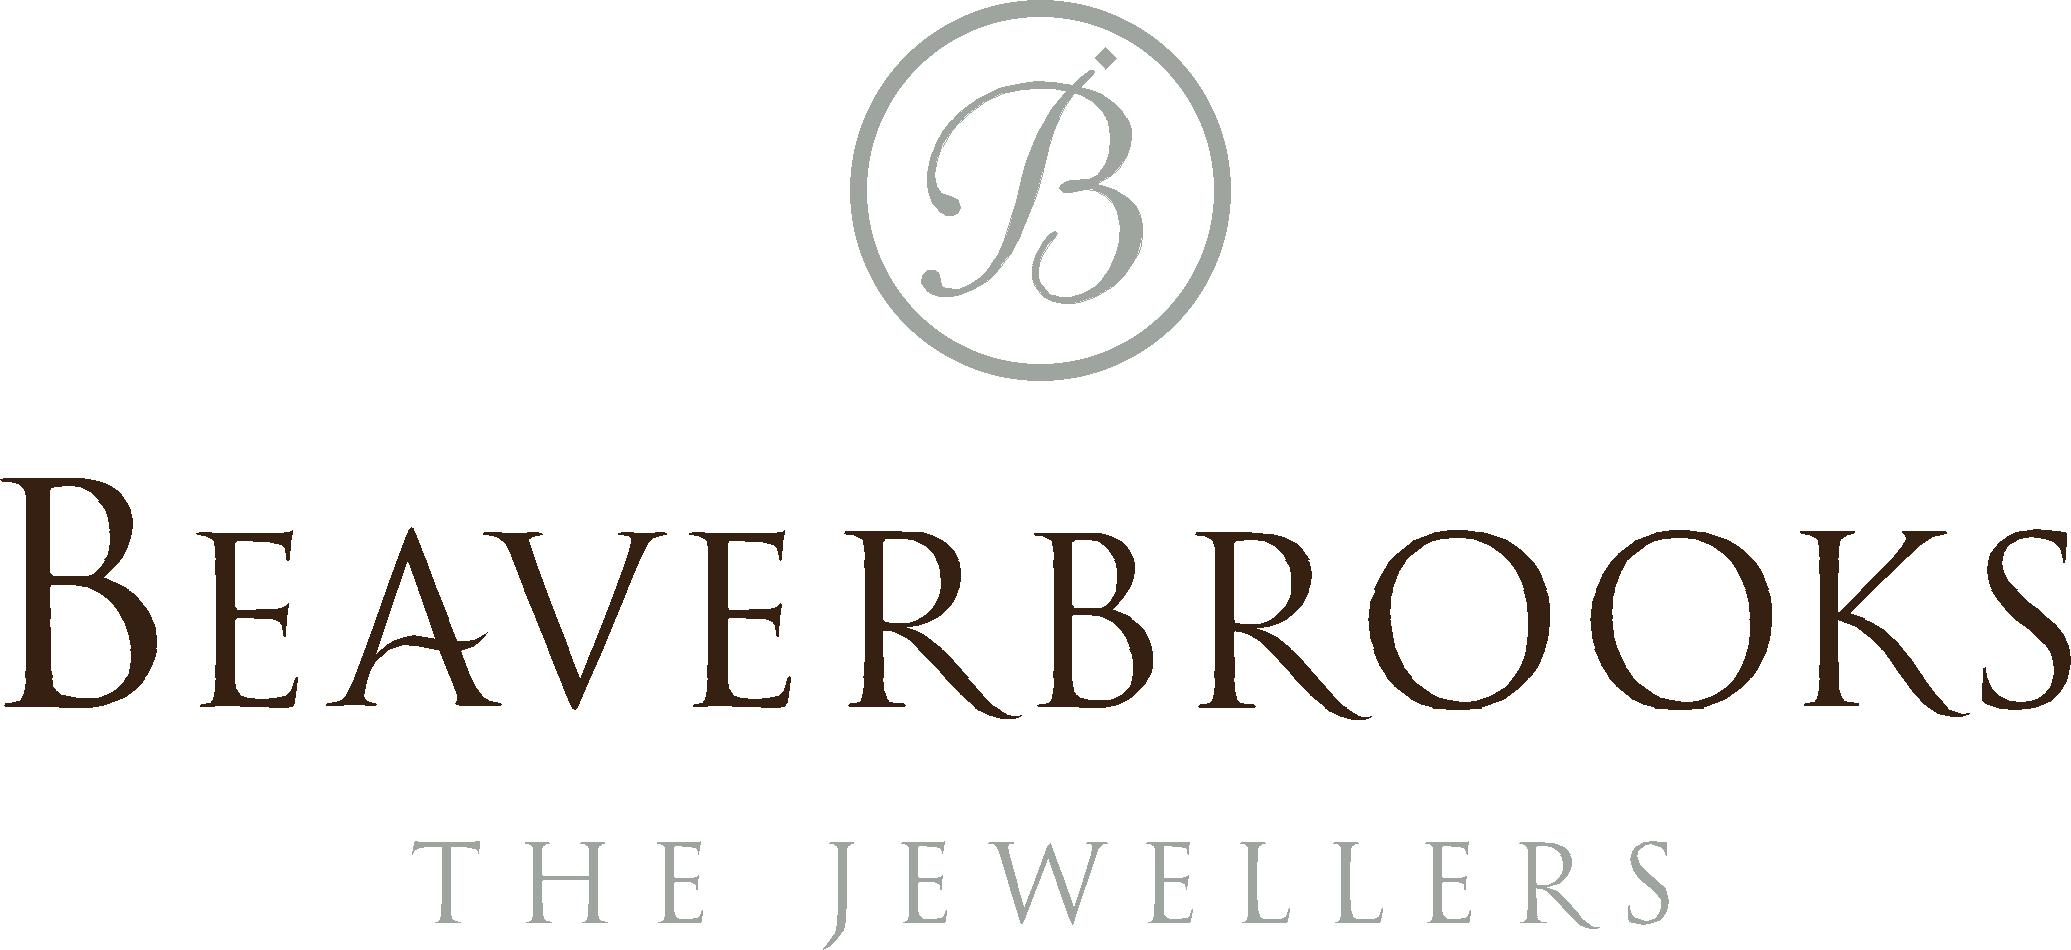 beaverbrooks promo code